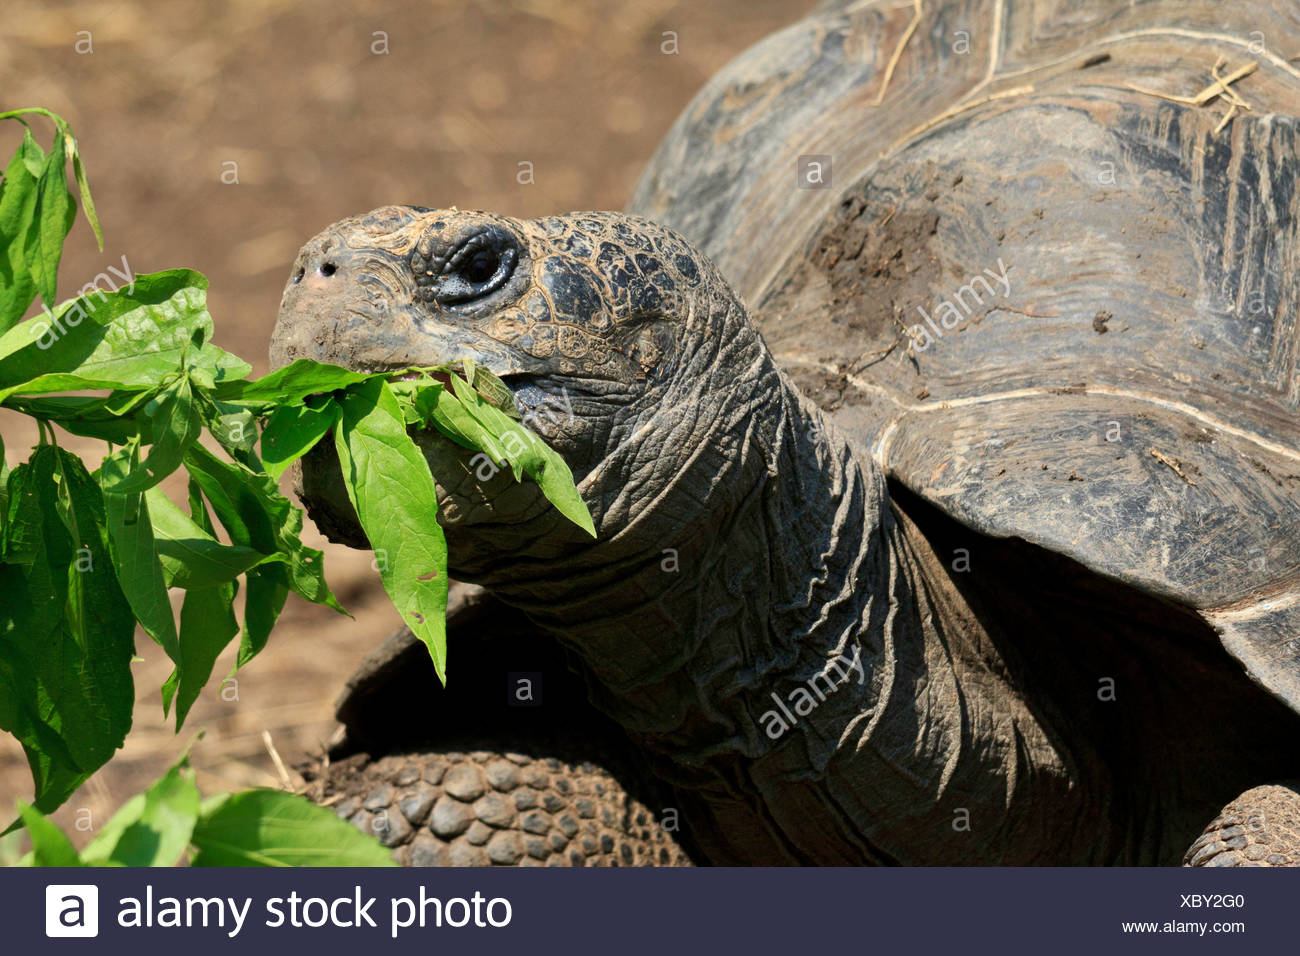 Animalia, Chordata, Dallas Zoo, Galápagos tortoise, geochelone nigra, Giant tortoise, largest living tortoise, reptilia, Testudi - Stock Image